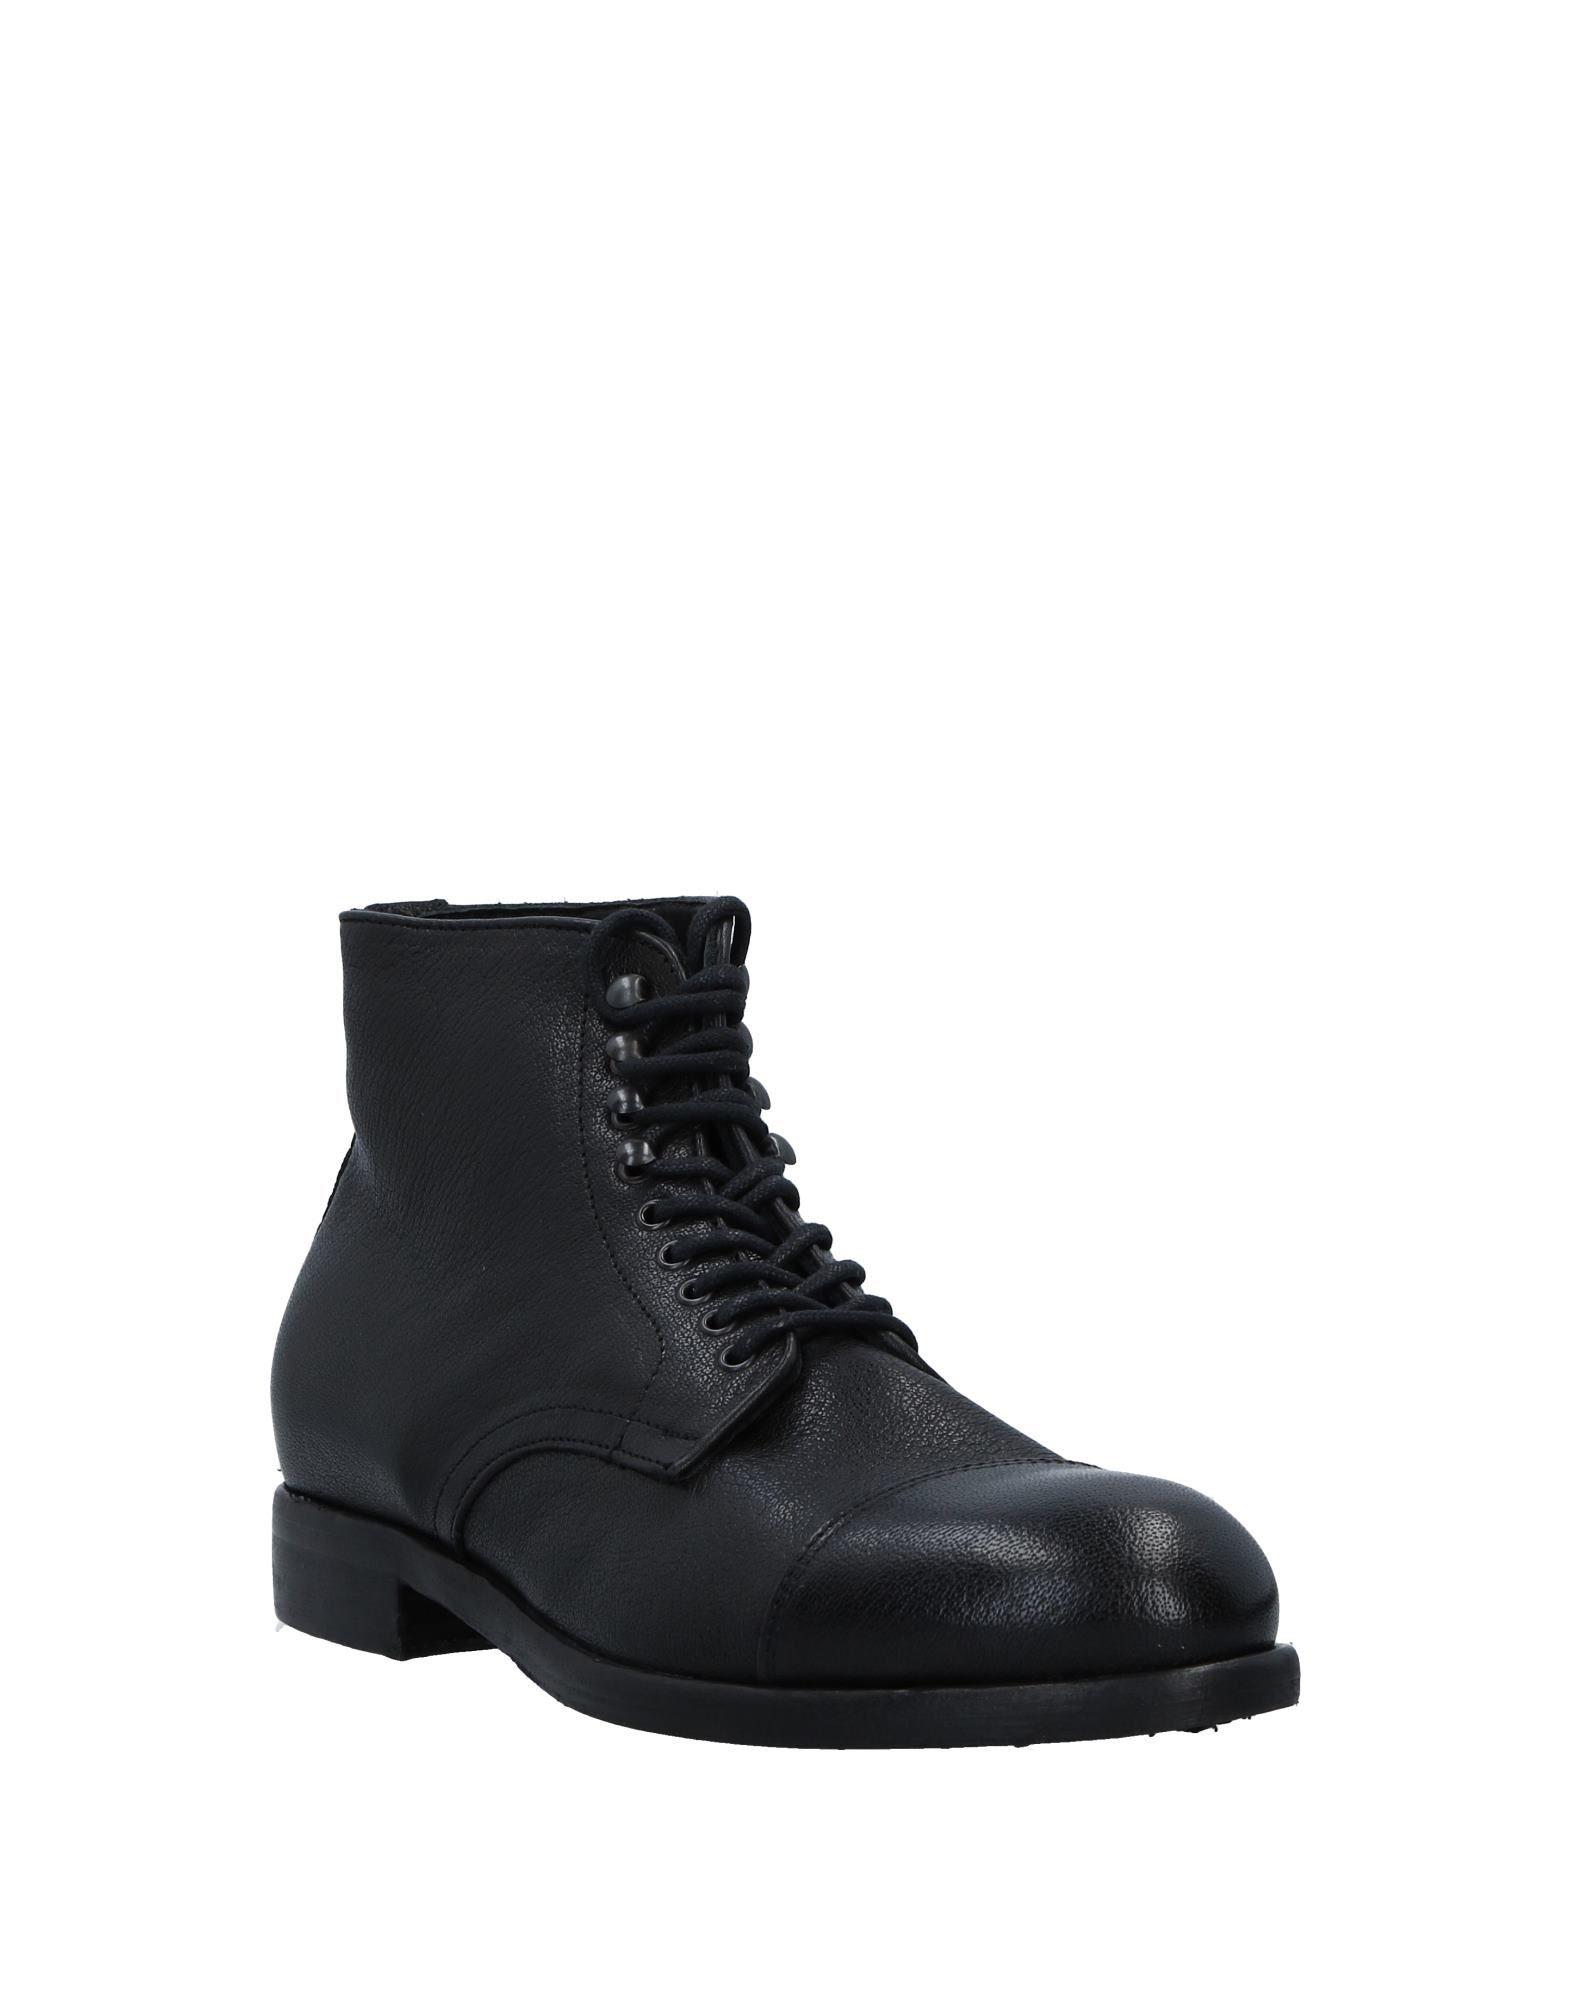 Bottine Homme Noir Bottines Eveet Eveet Chaussures femme pas Noir rr4qUBw